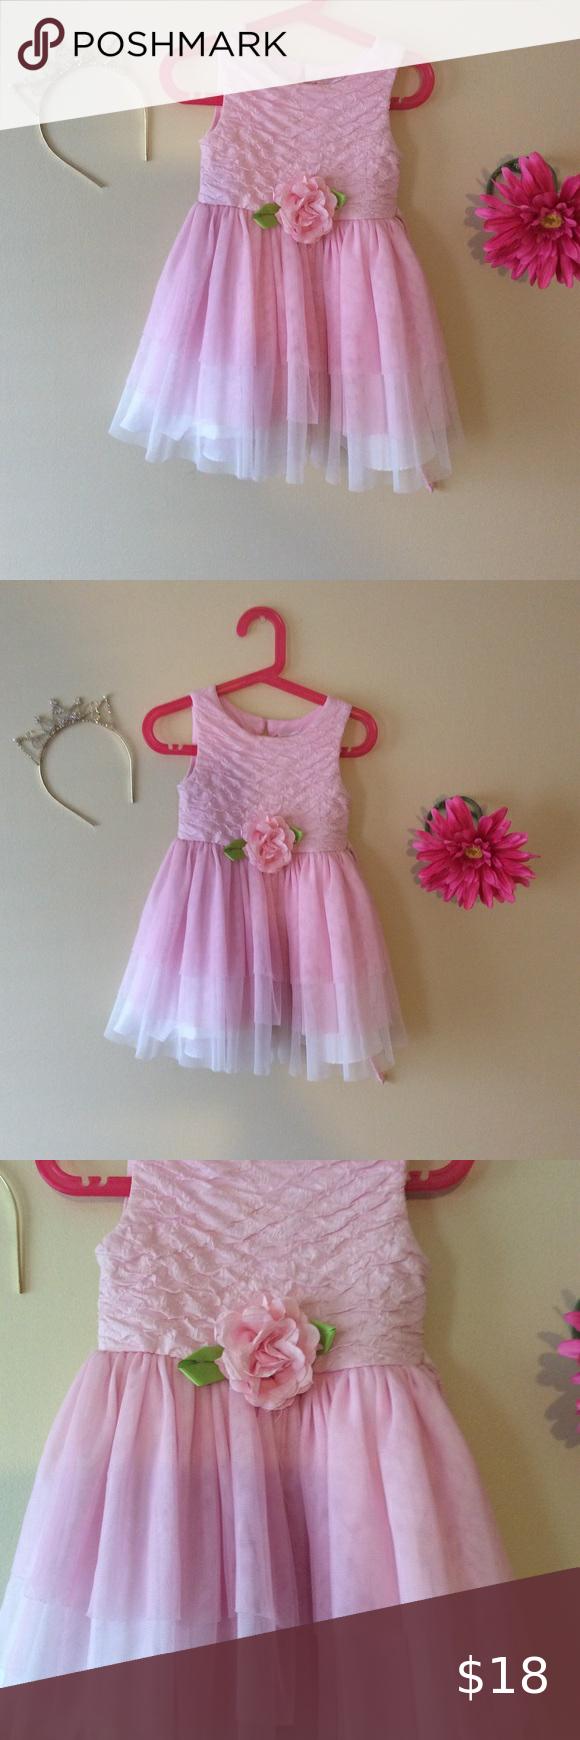 3 For 28 Youngland Toddler Dress 4t Toddler Dress 4t Dress Kids Dresses [ 1740 x 580 Pixel ]